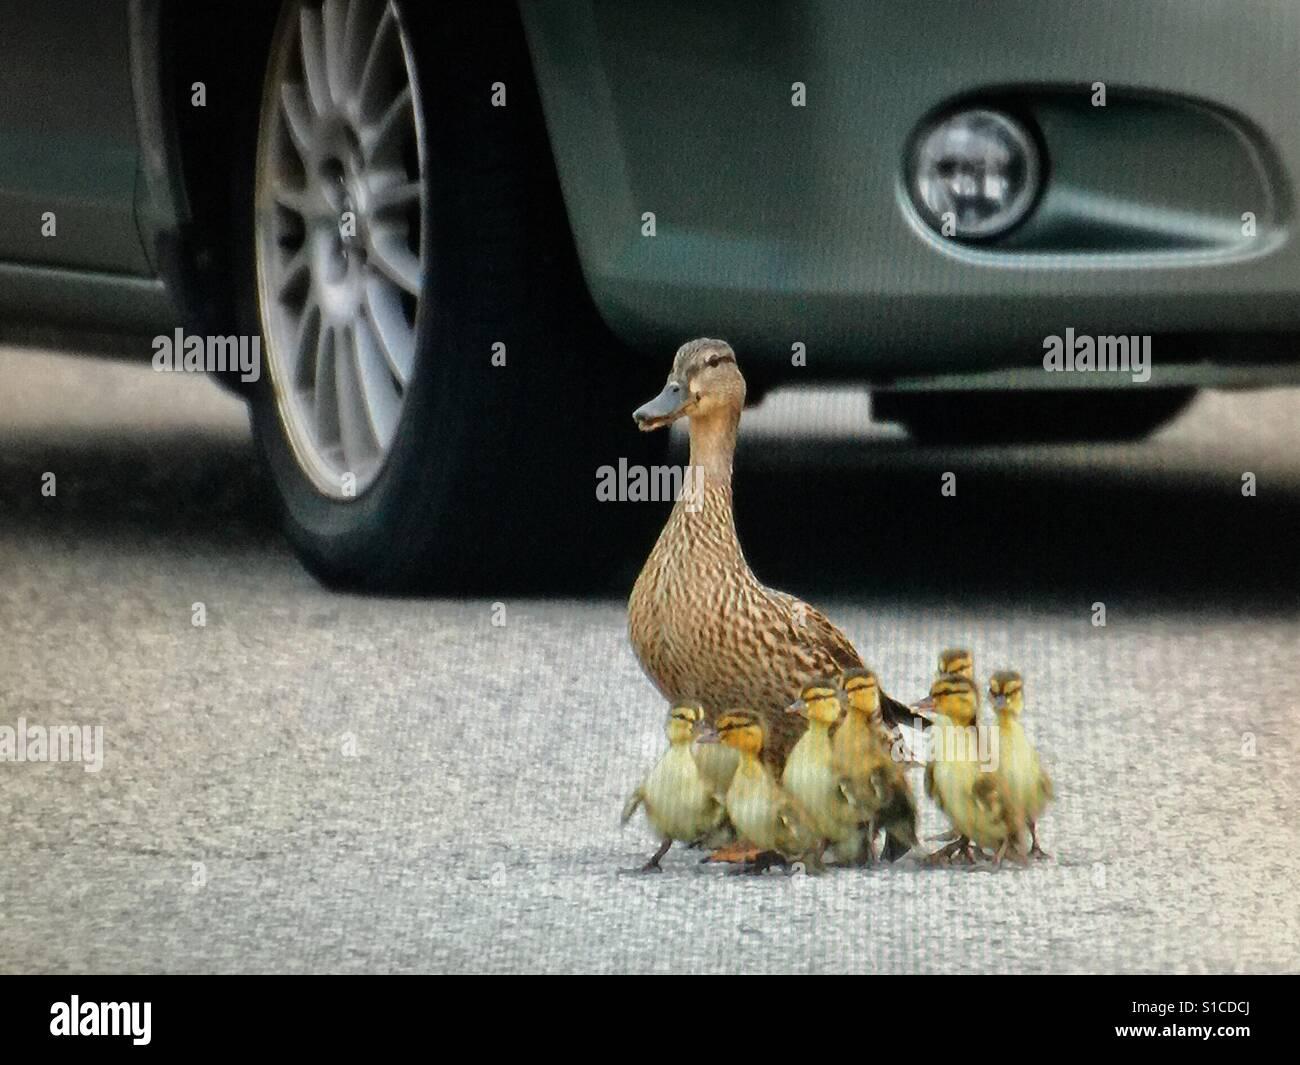 Mallard duck family crossing a busy street - Stock Image